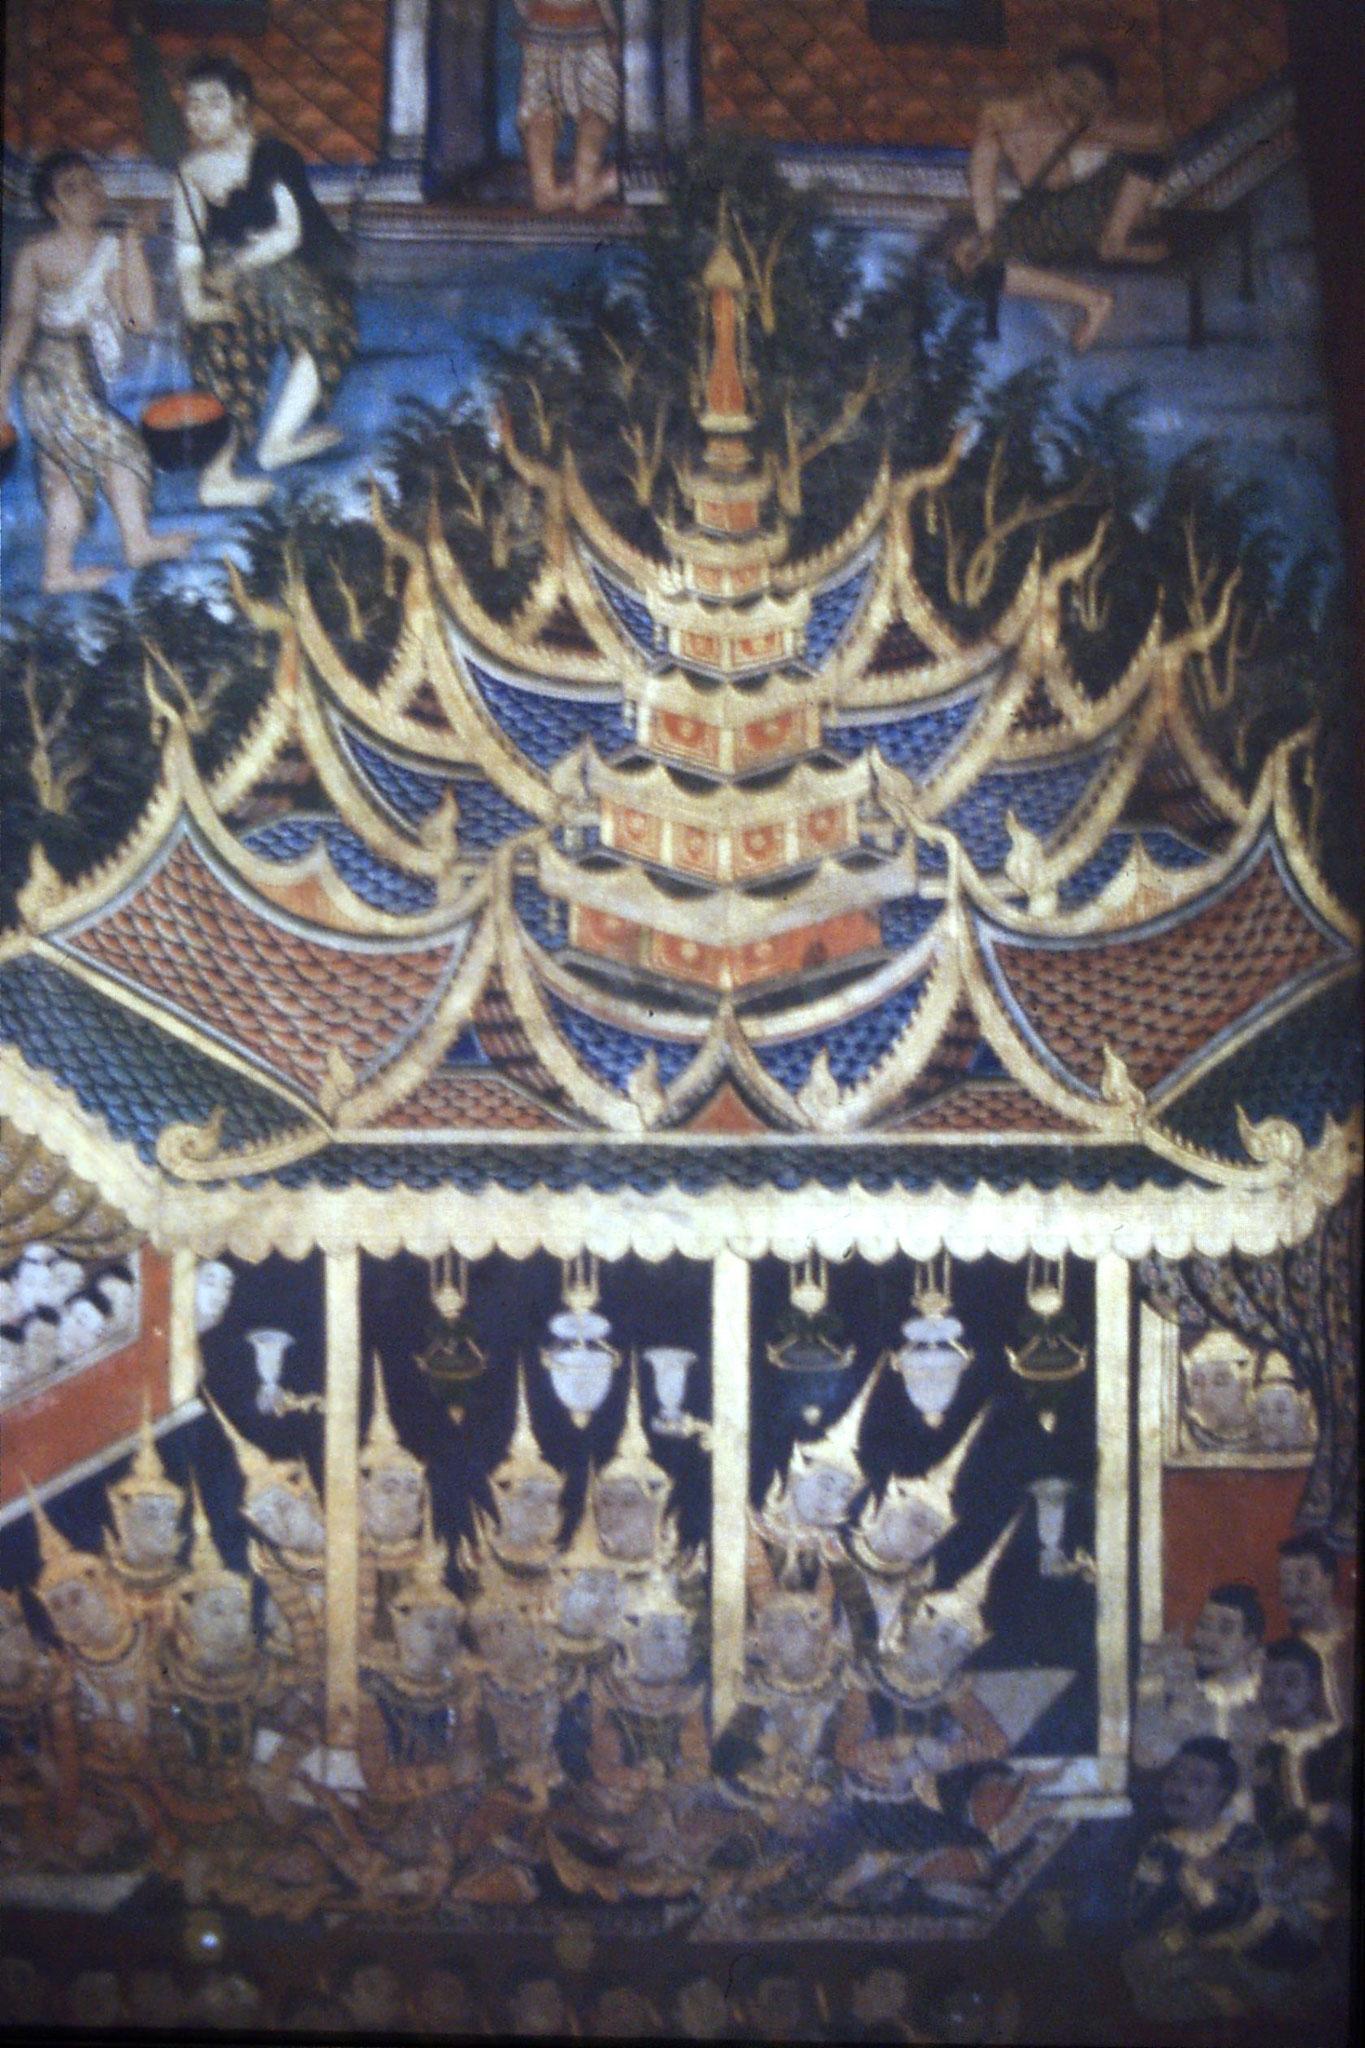 14/6/1990: 0: Chang Mai, Wat Phra Singh frescoes